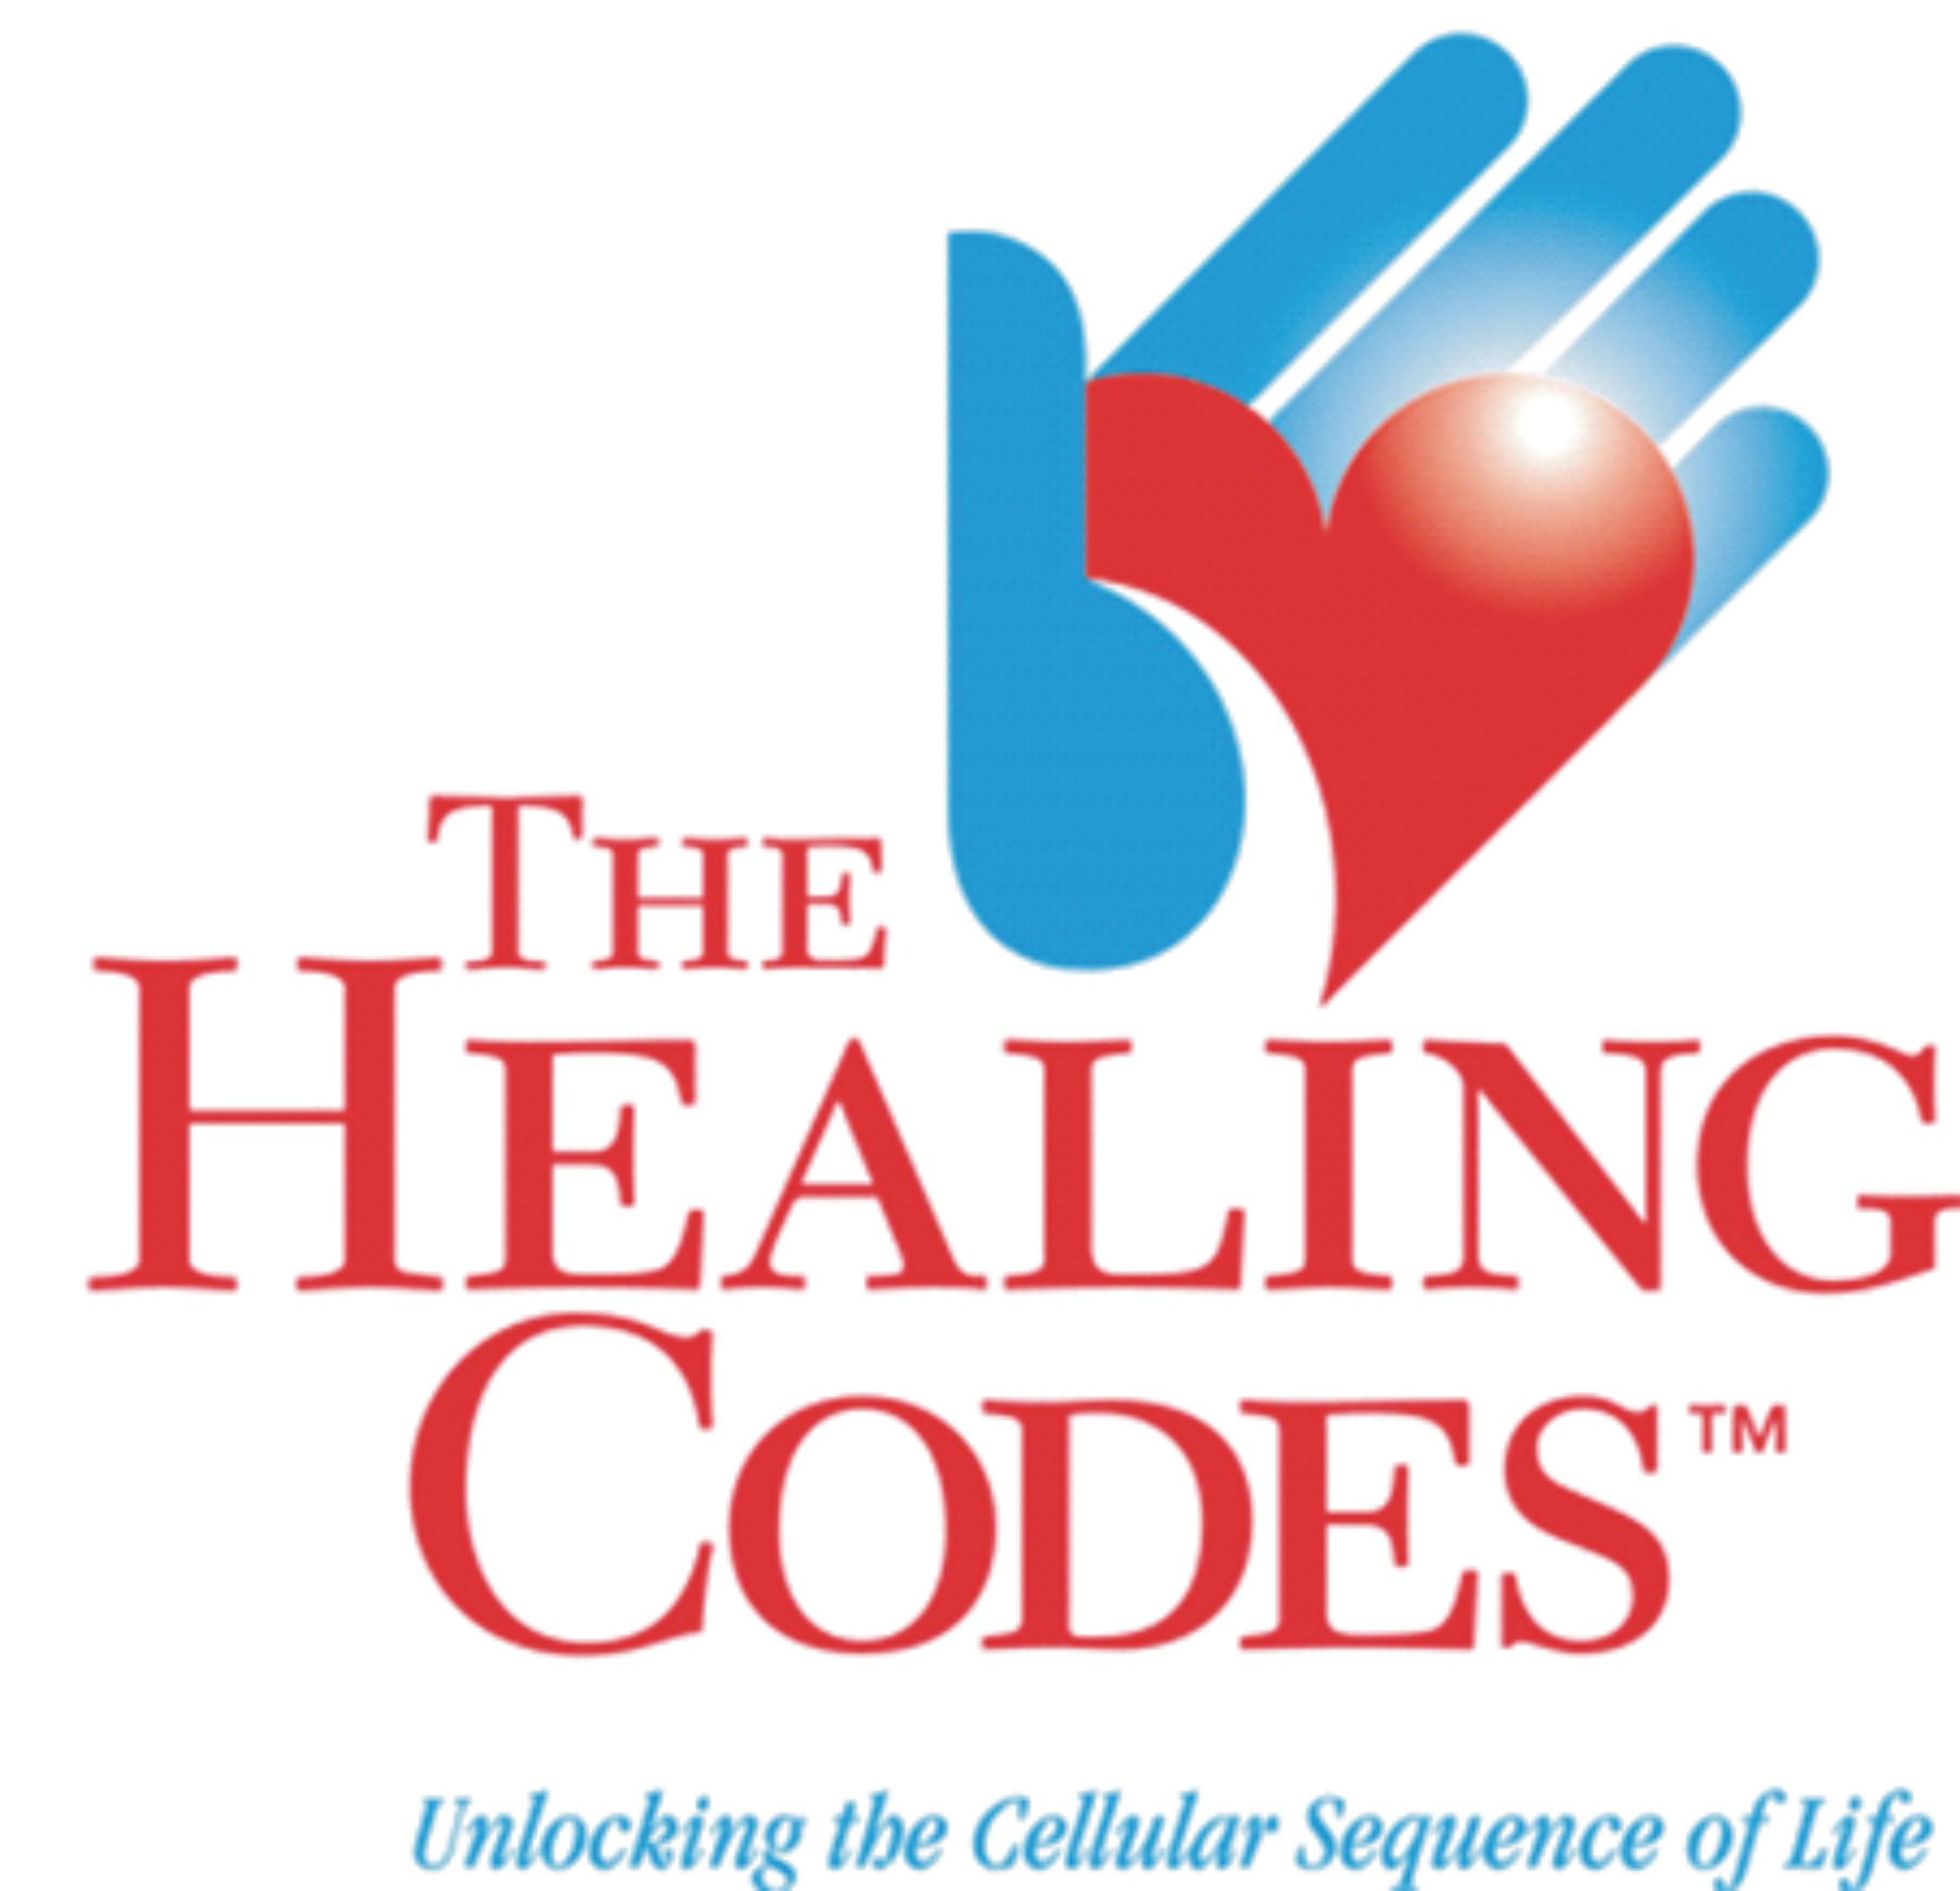 The Healing Codes Logo